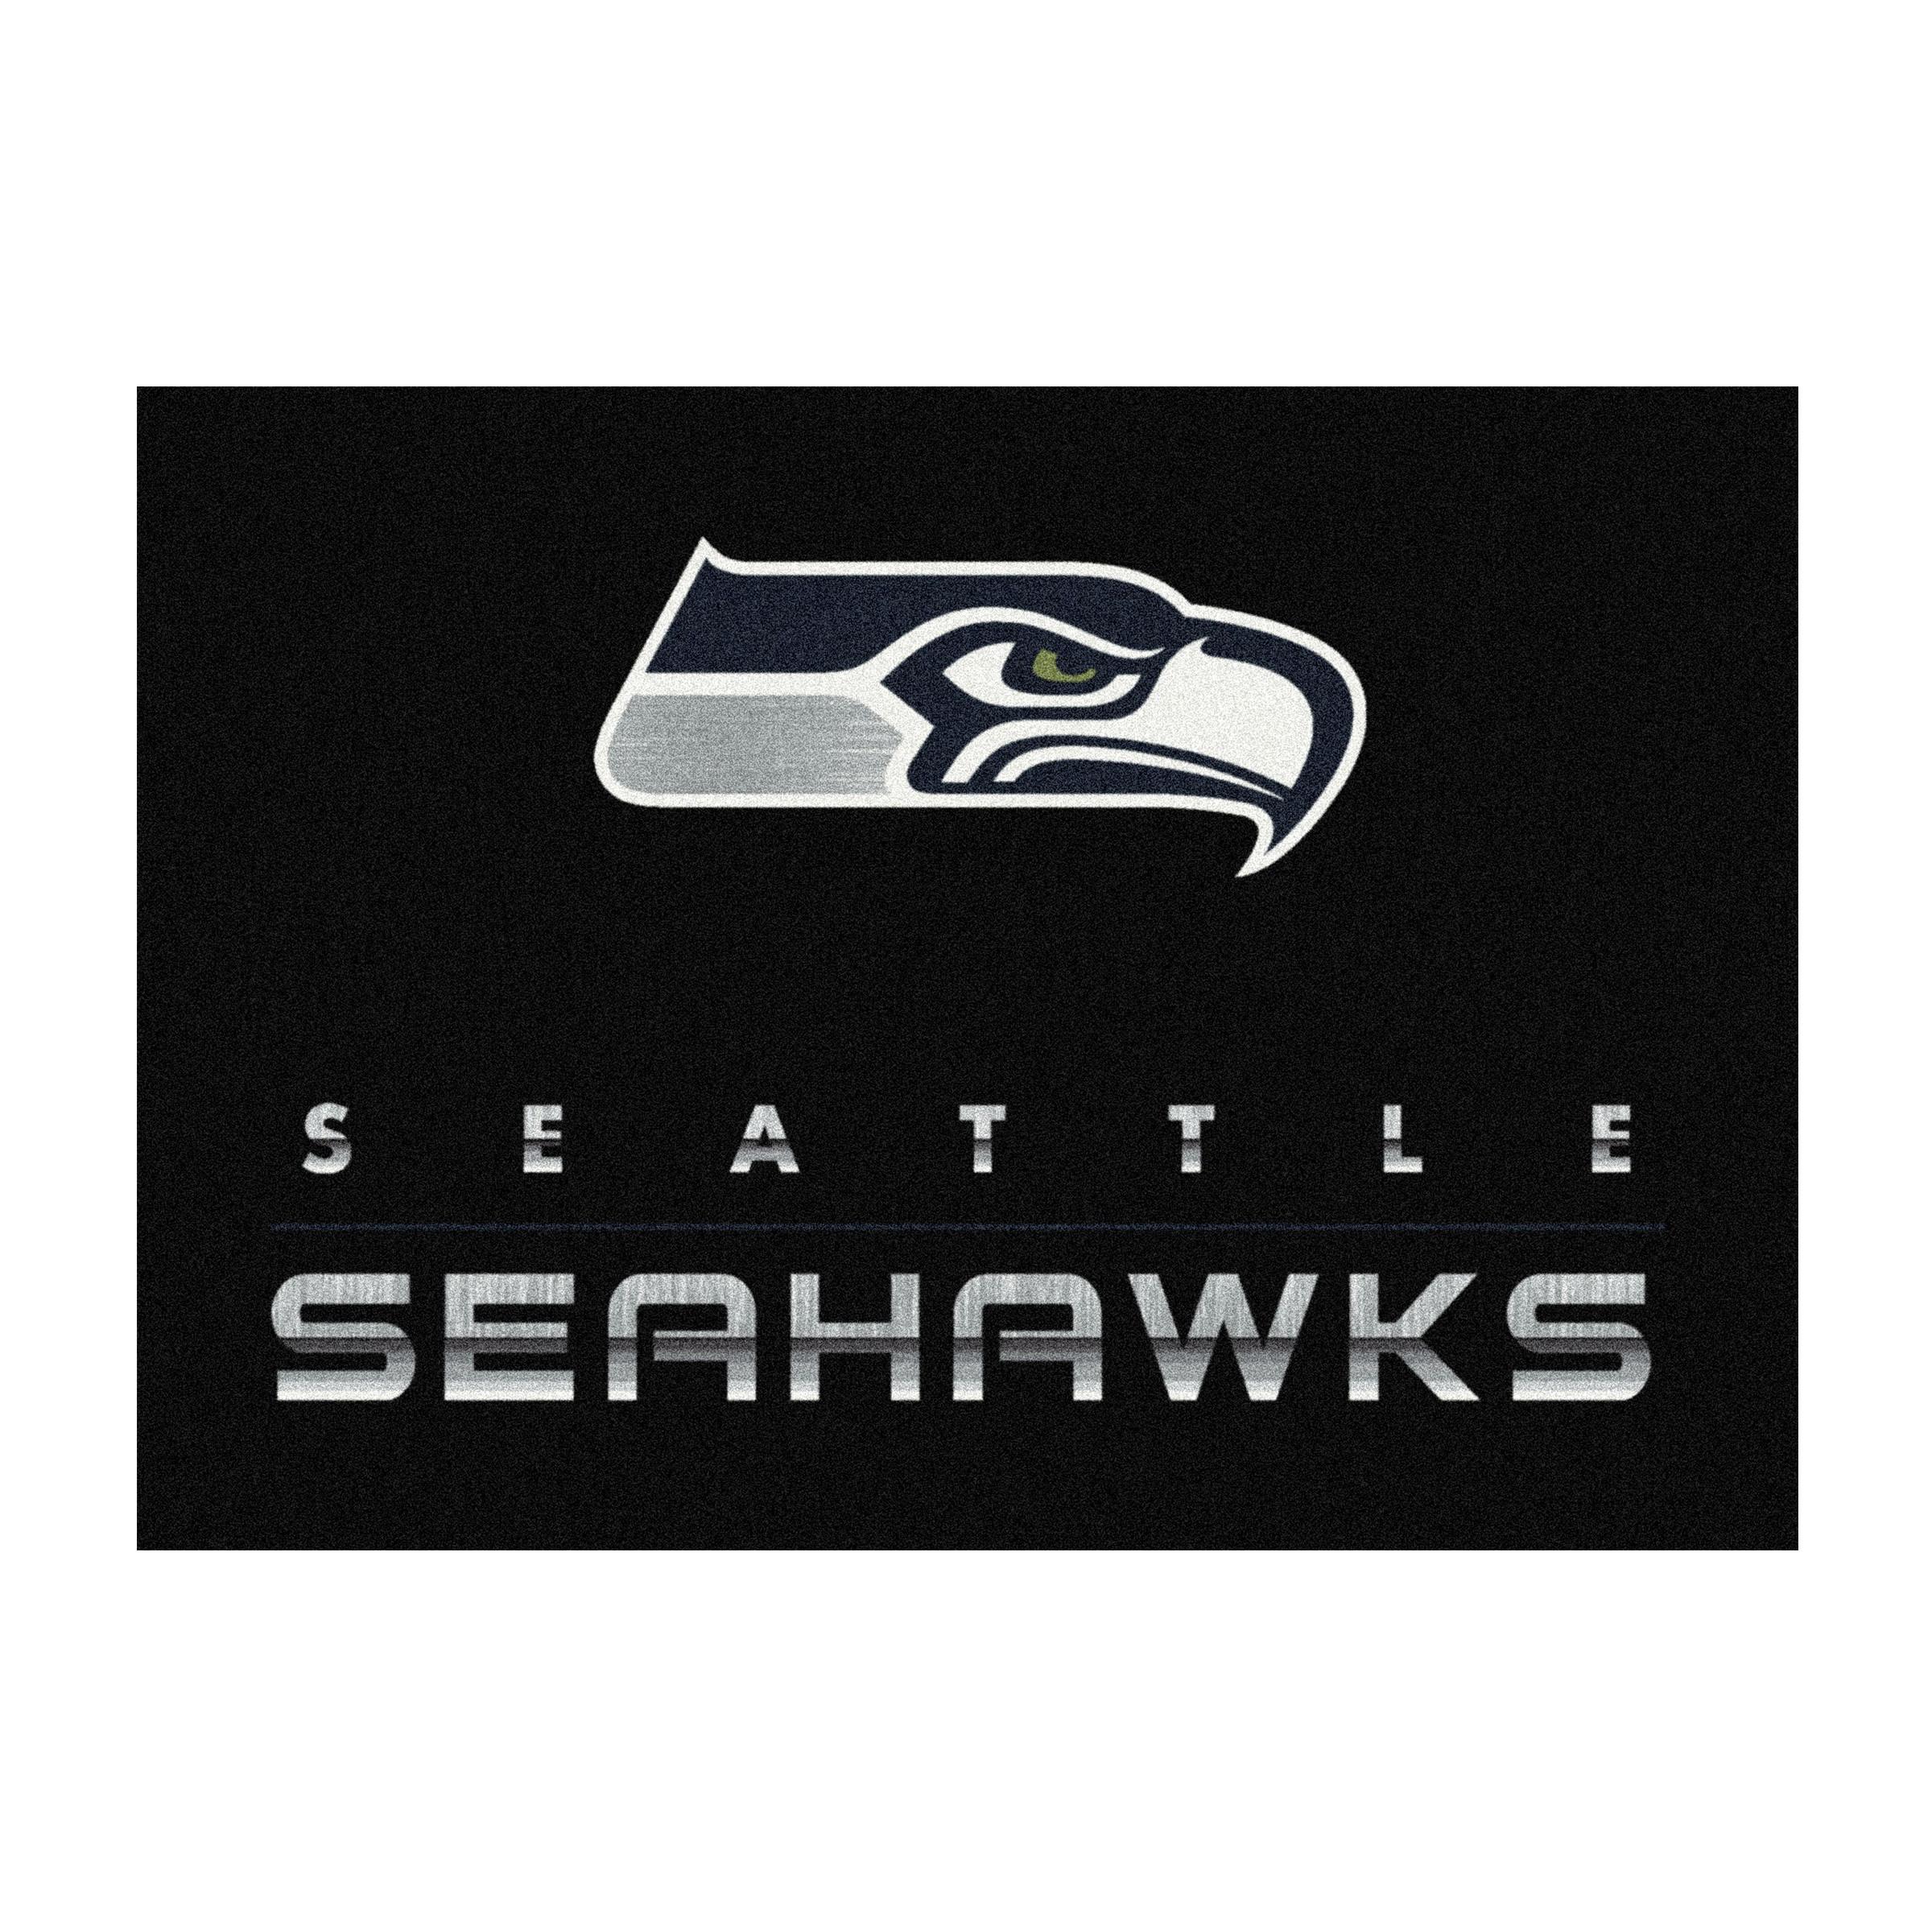 SEATTLE SEAHAWKS 6X8 CHROME RUG